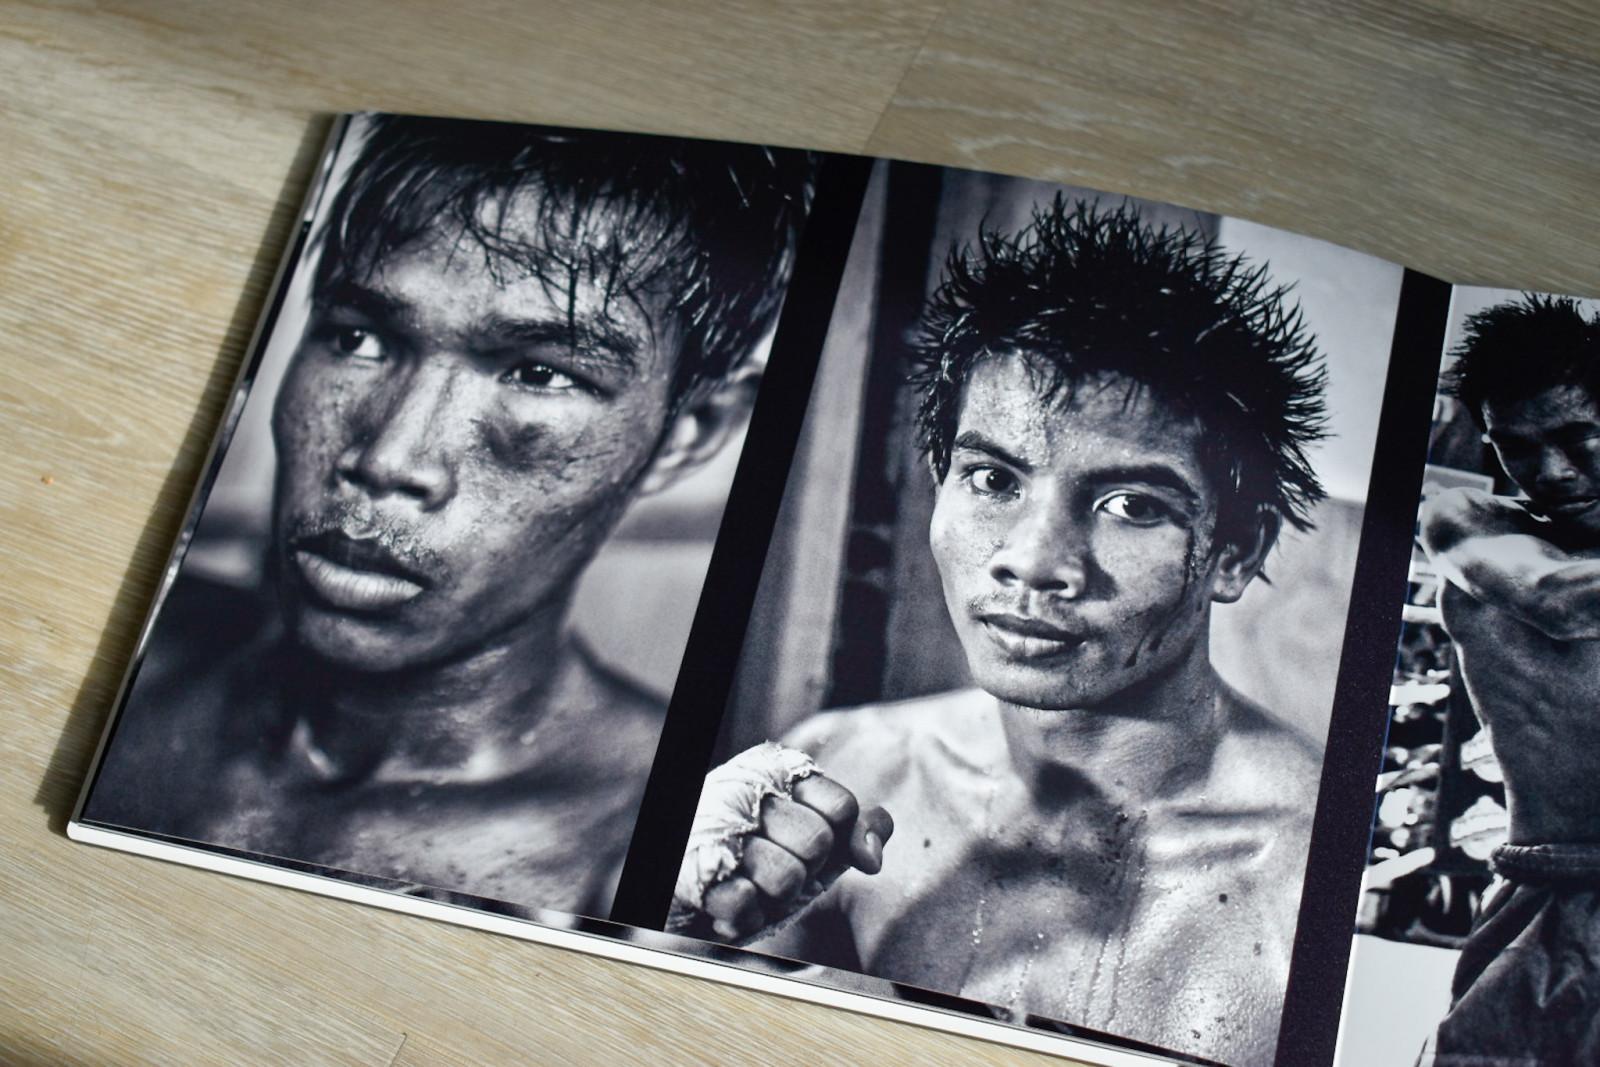 saal-digitaal-klinkhamer-noir-boxing-cambodia